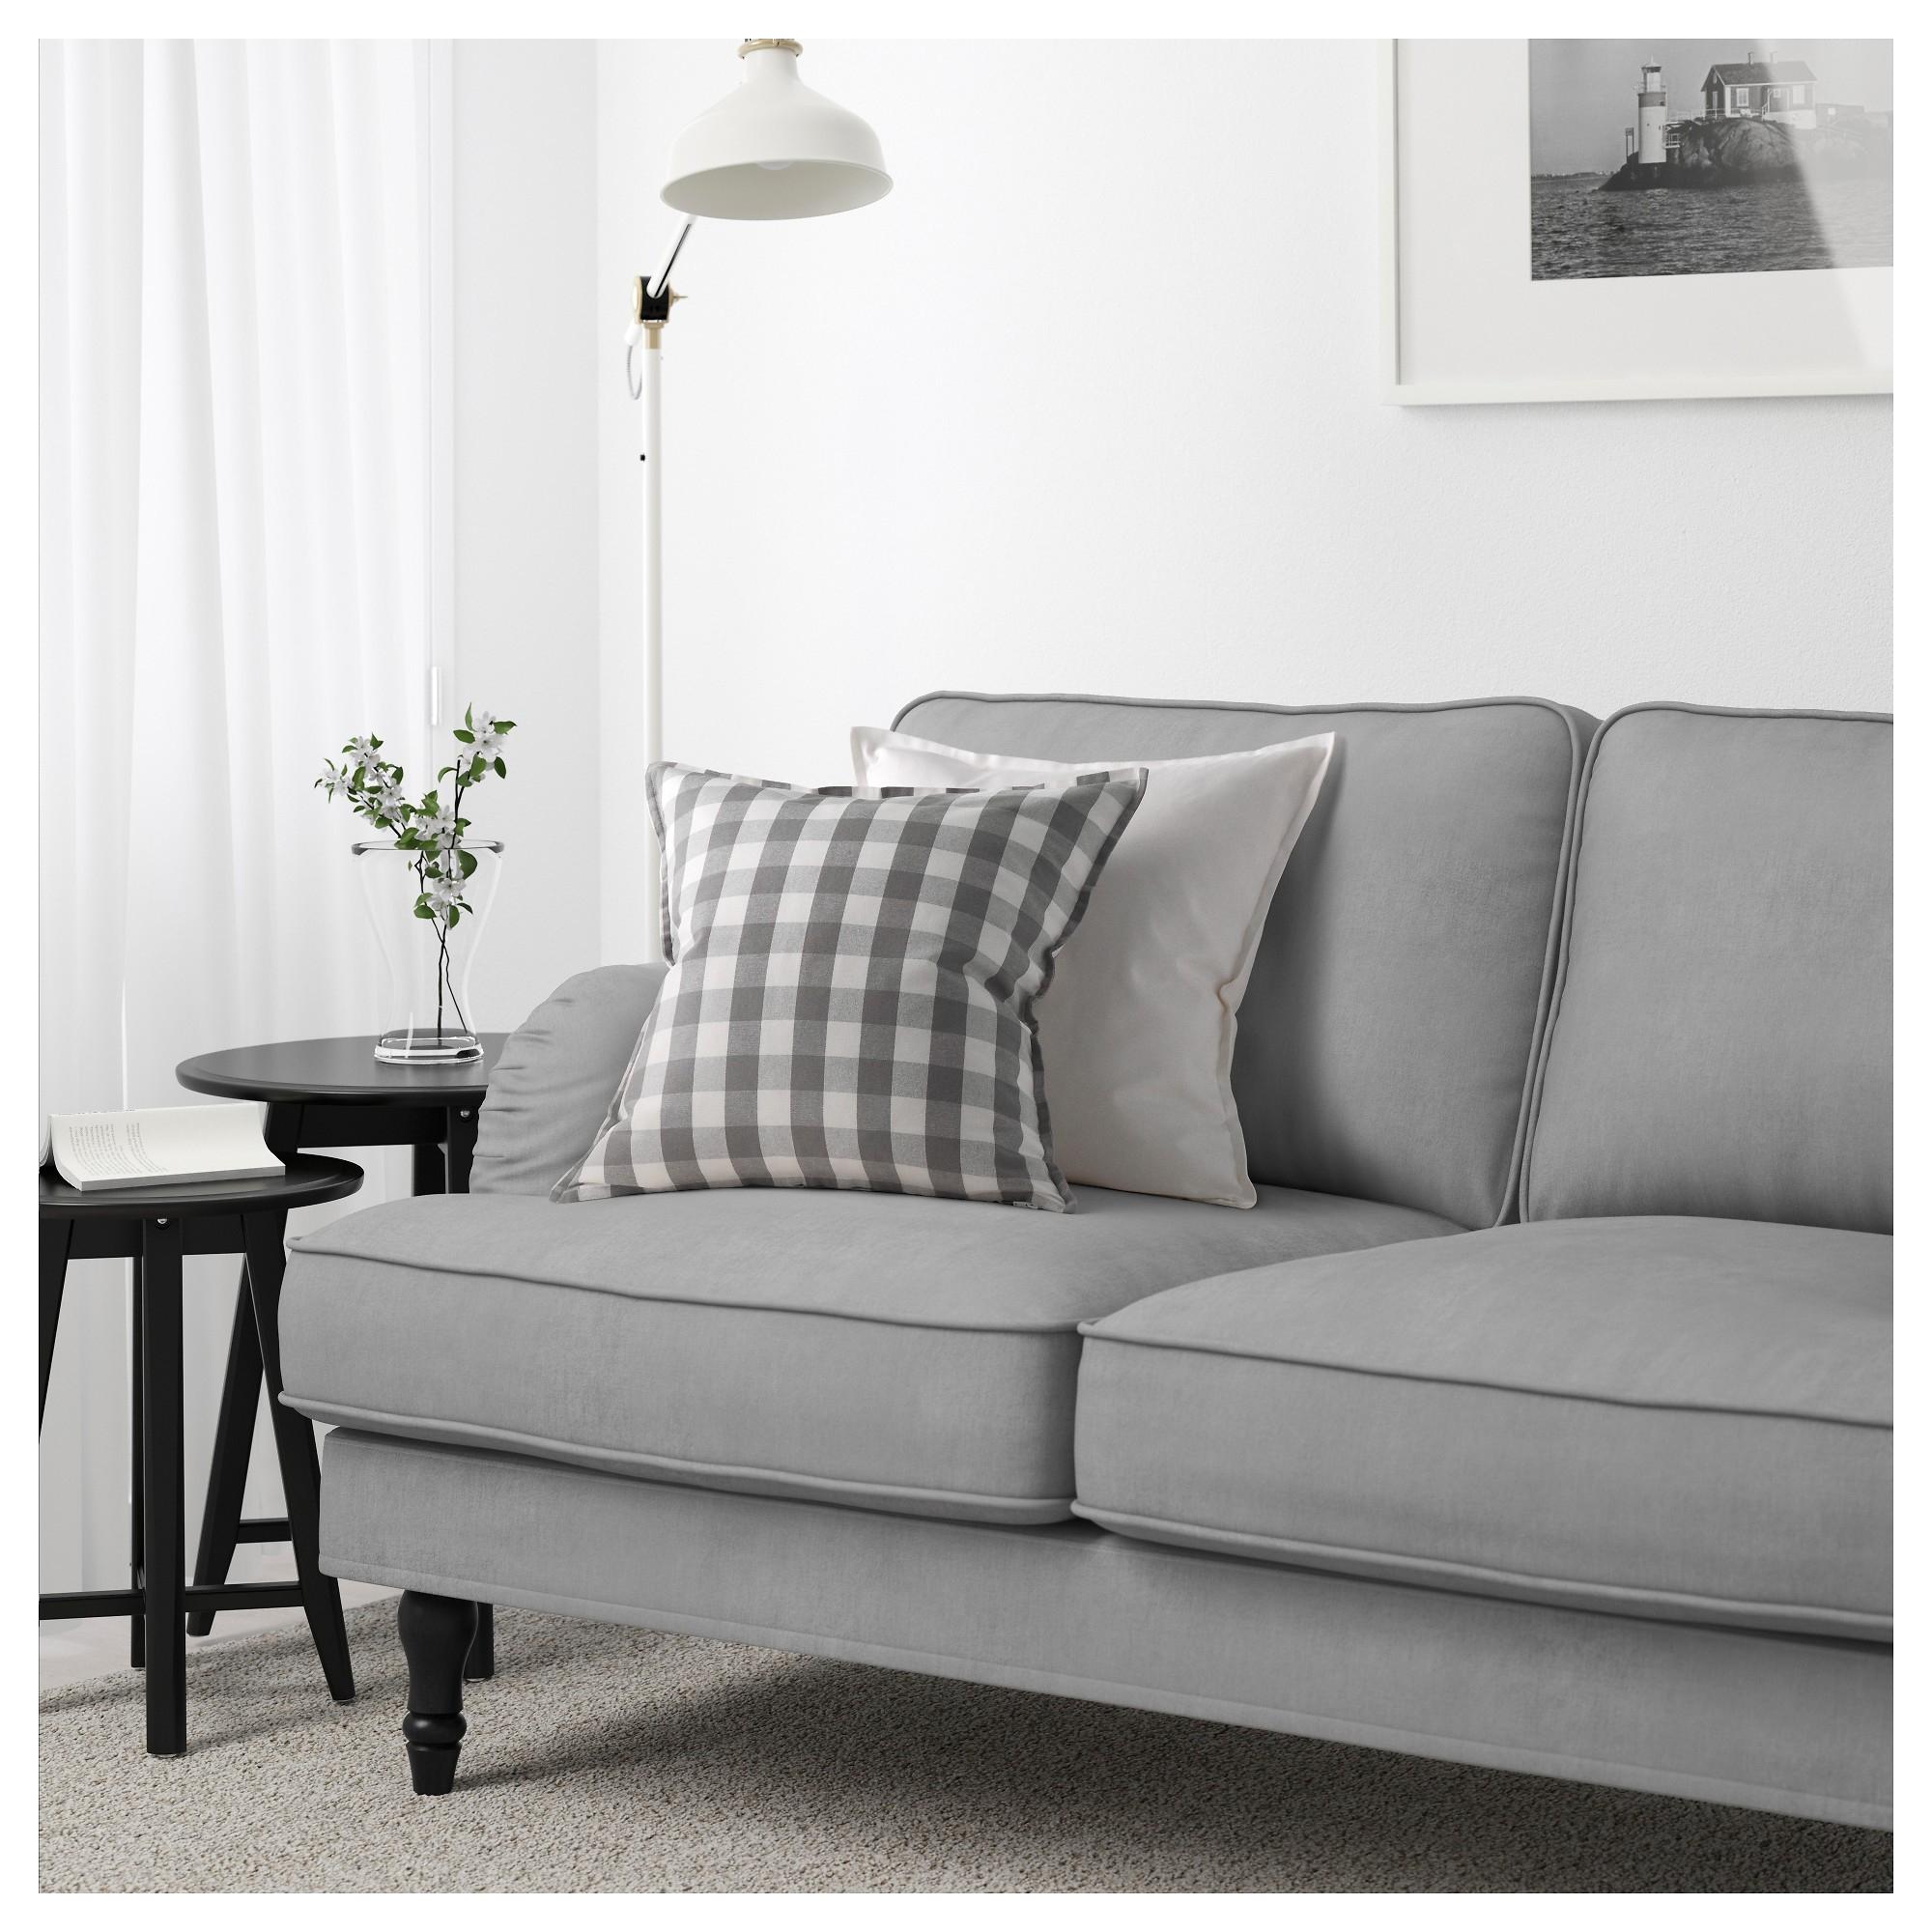 ikea armchair reviews lovely sofa ikea interior 48 unique microfiber sofa sets microfiber sofa 0d